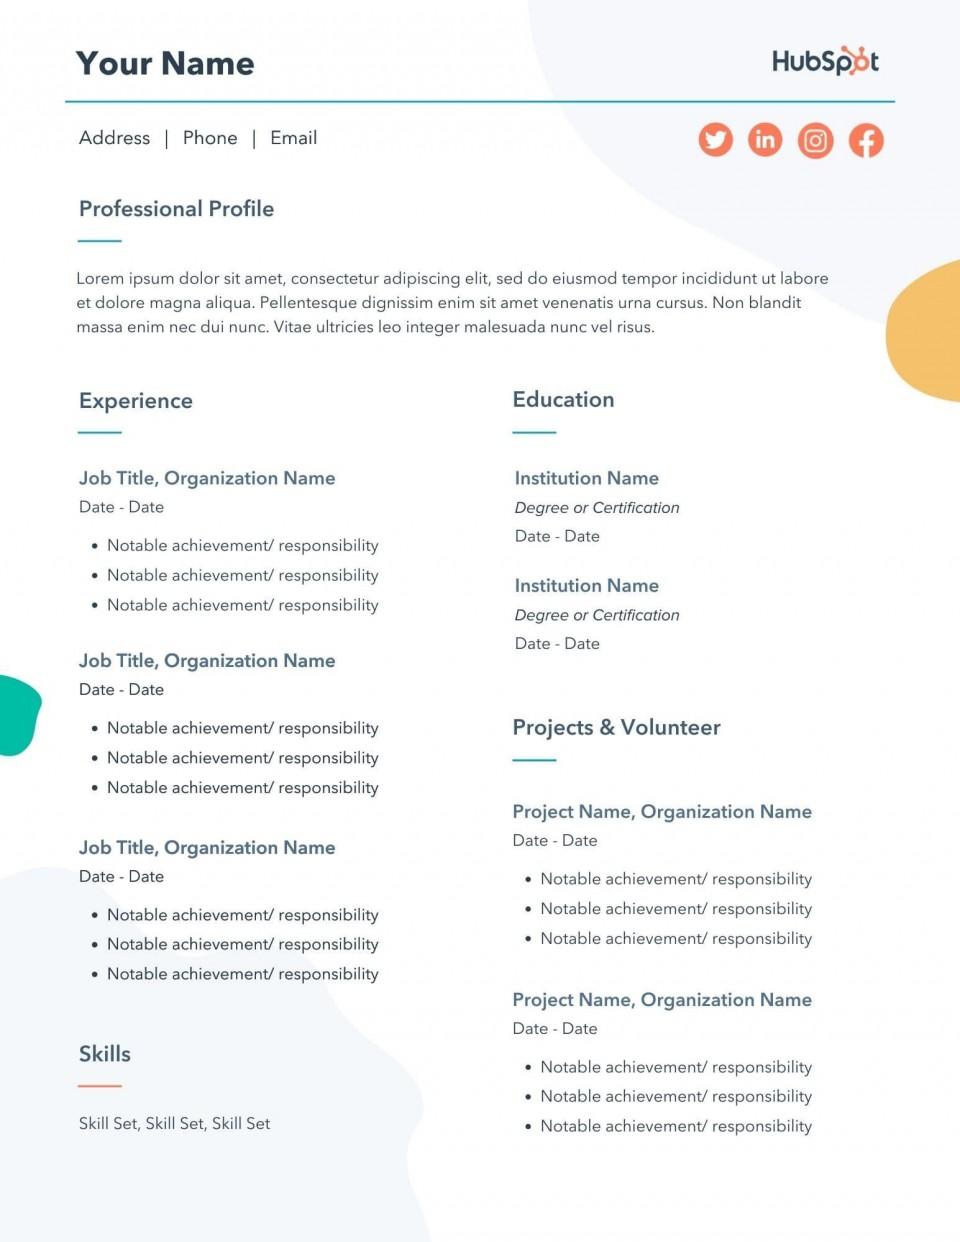 010 Magnificent Professional Cv Template Free Online Idea  Resume960